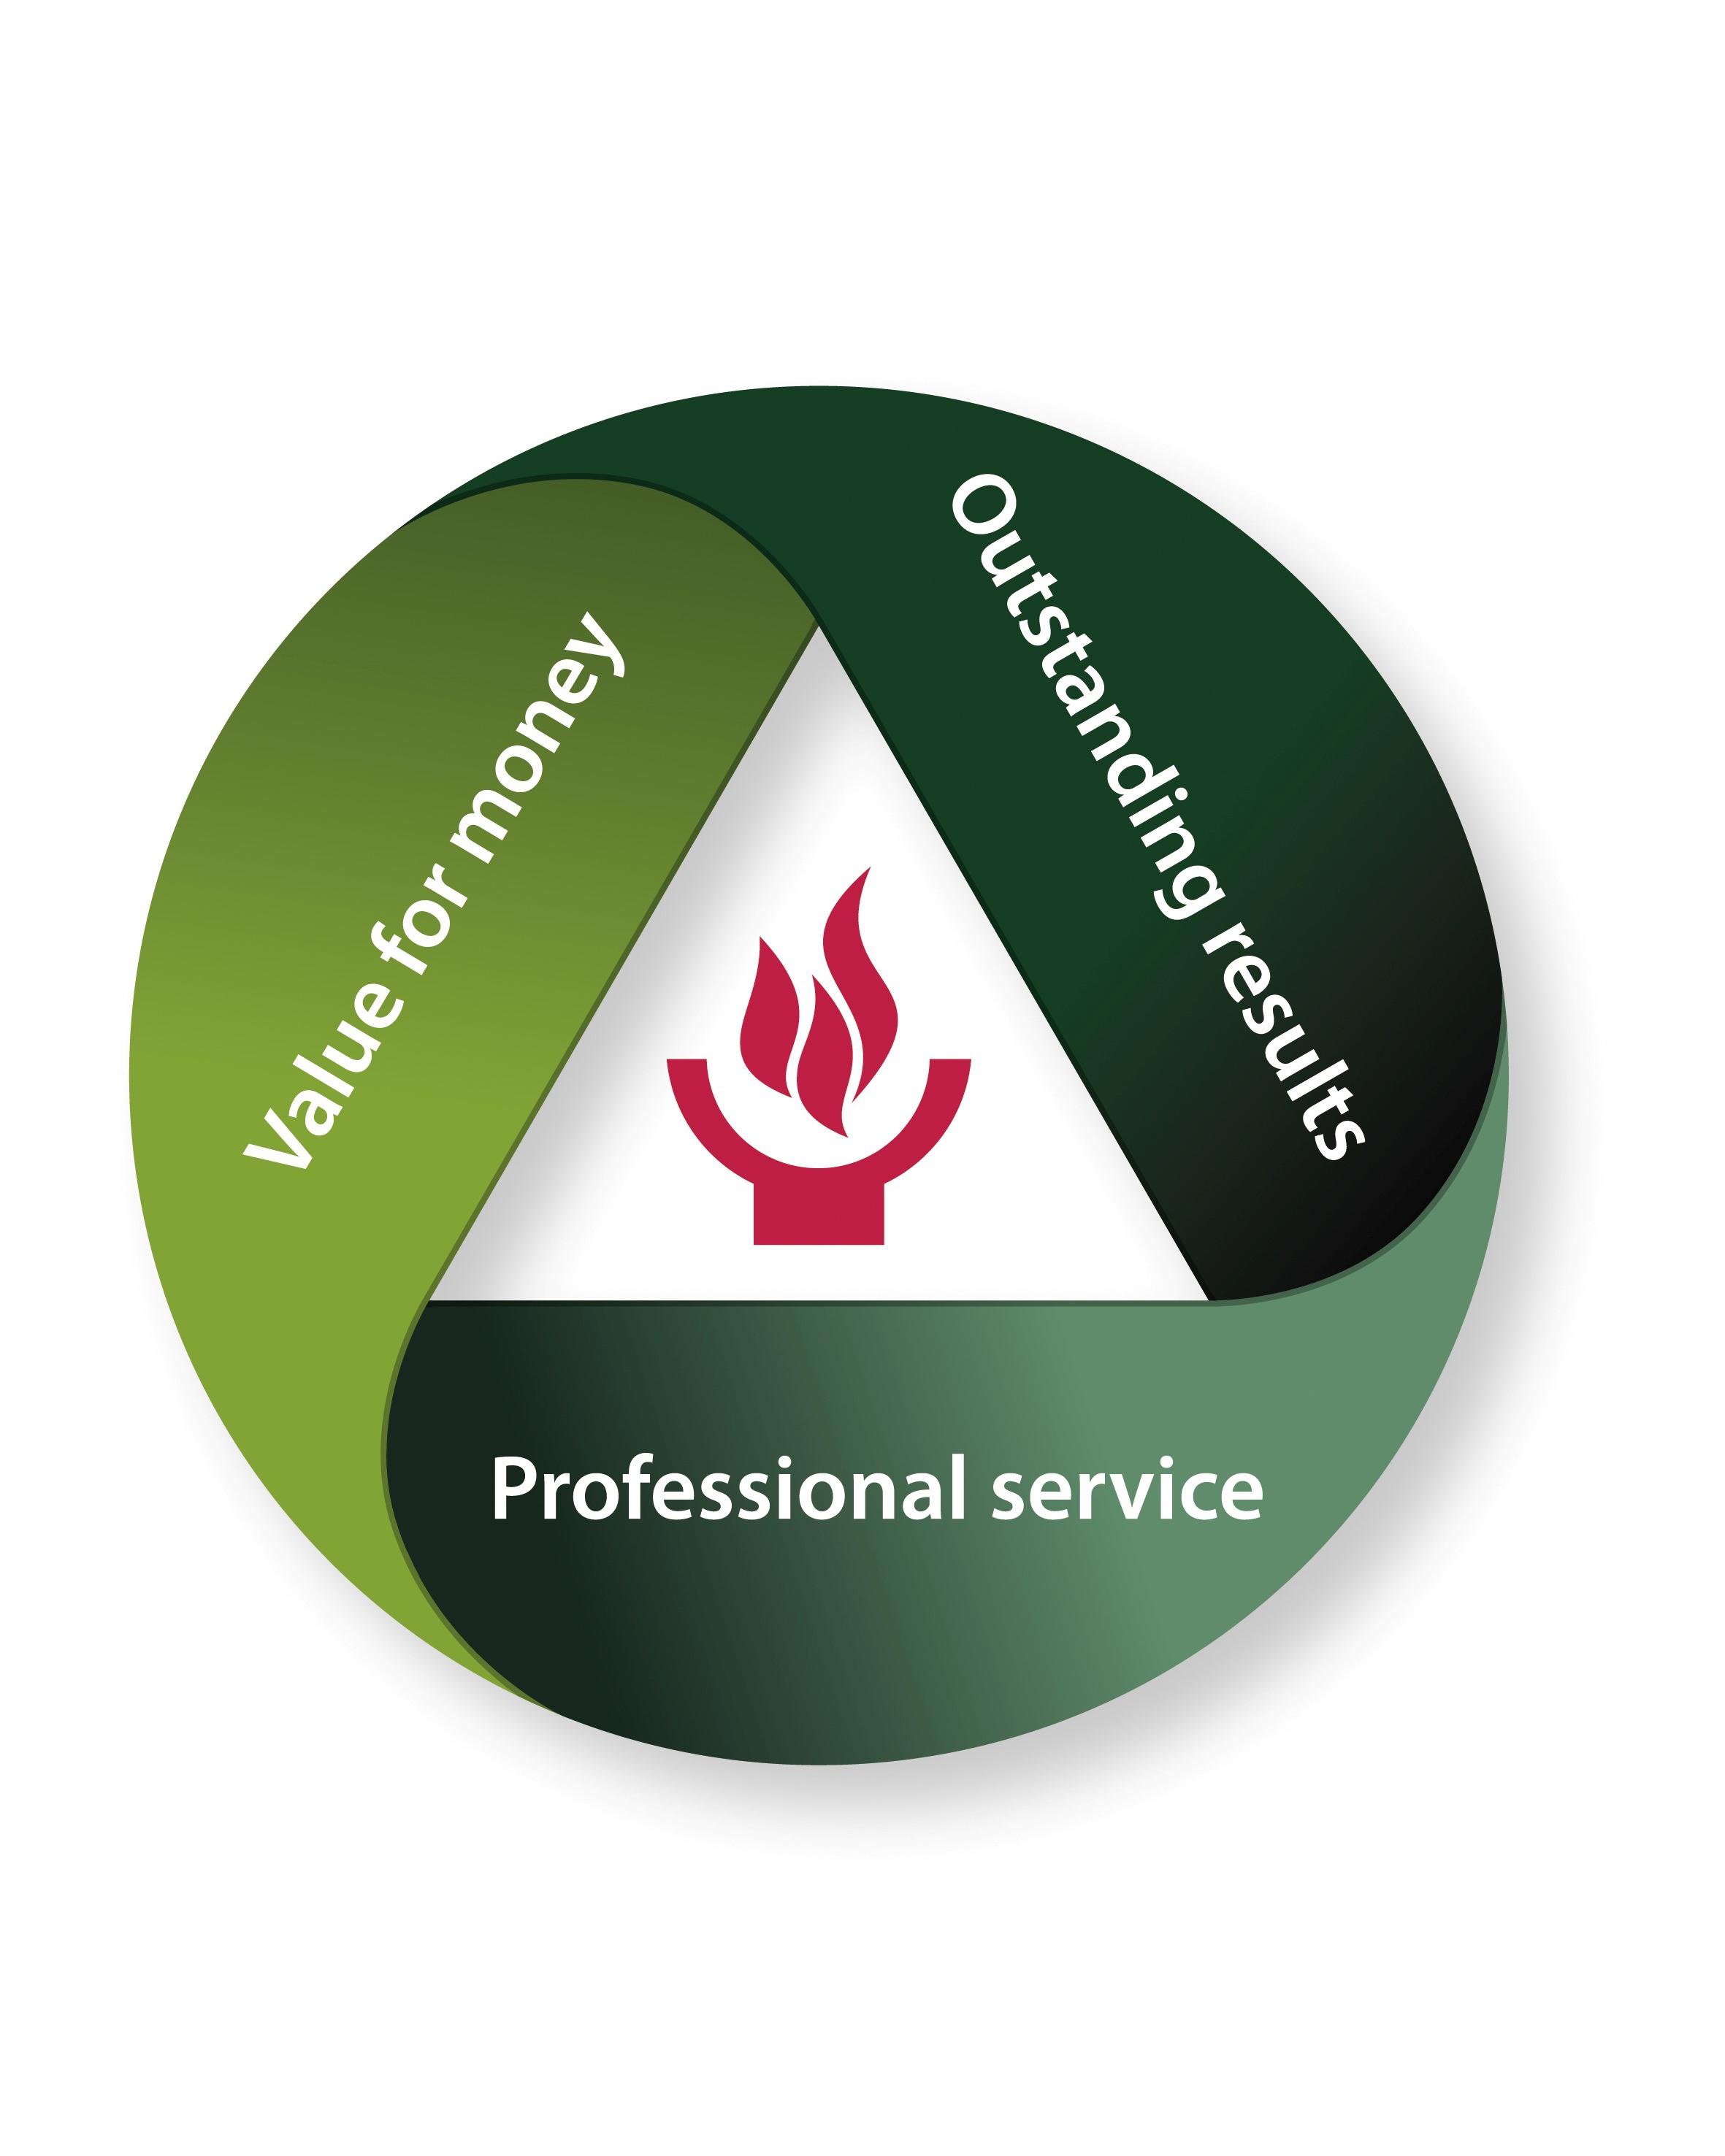 ValueForMoney_OutstandingResults_ProfessionalServices